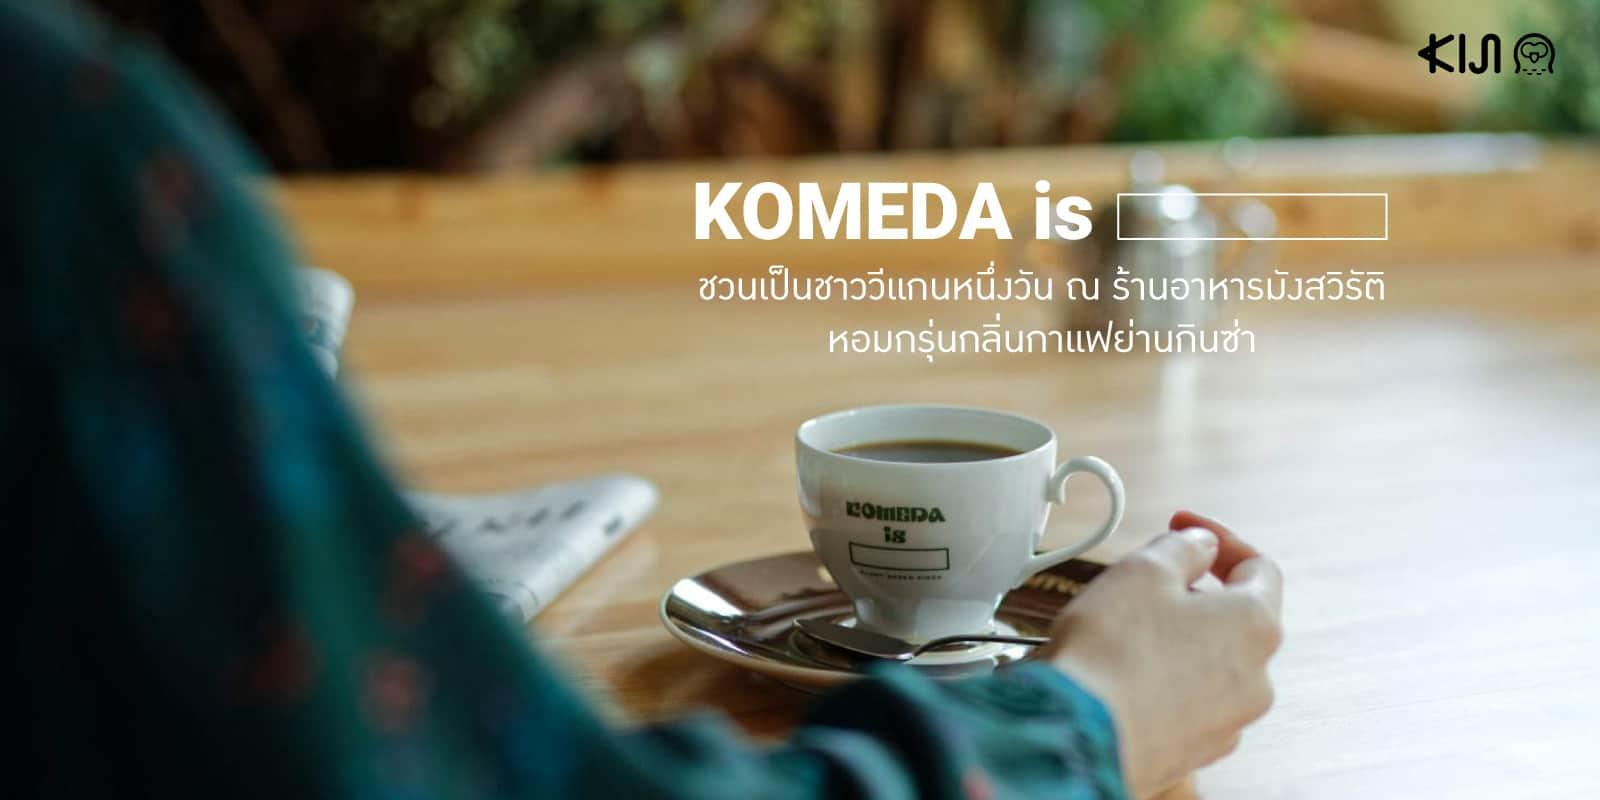 KOMEDA is □ ร้านอาหาร มังสวิรัติ โตเกียว